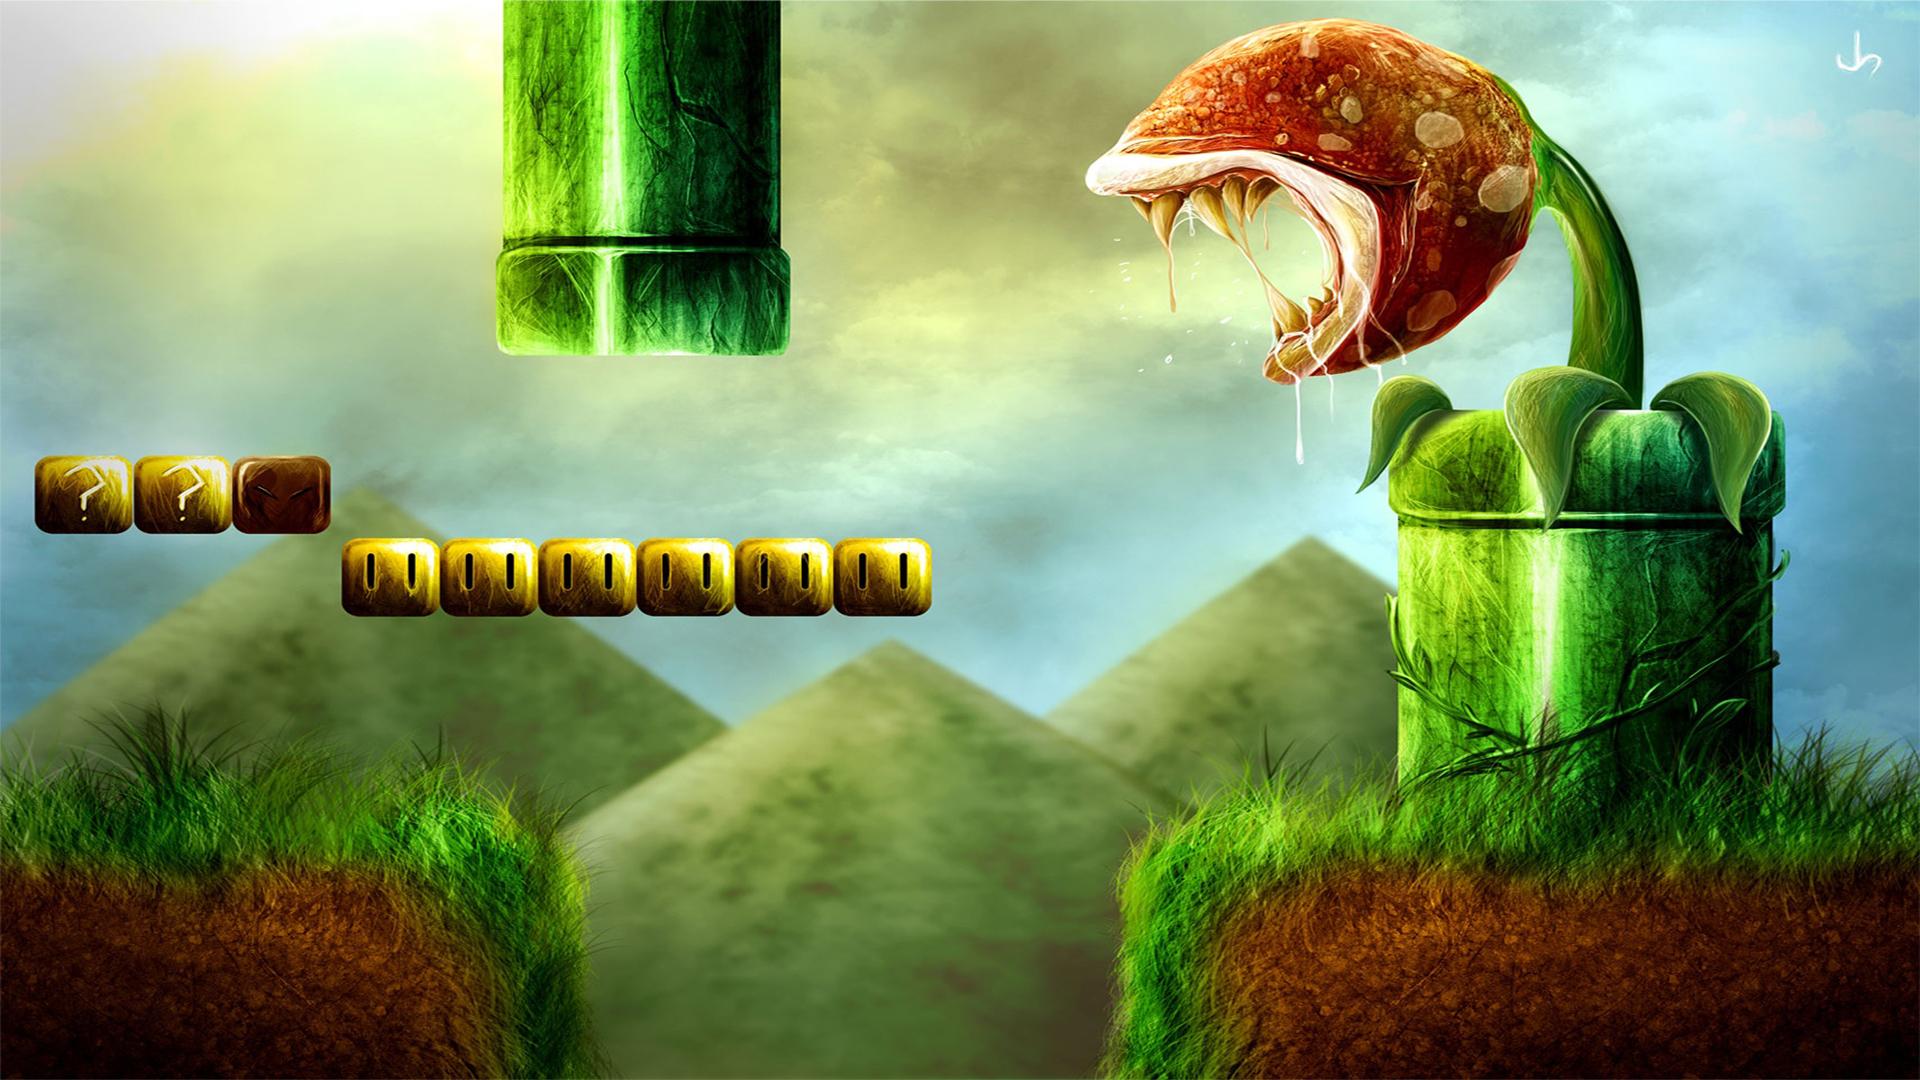 General 1920x1080 video games Super Mario digital art render video game art Super Mario Bros. grass plants pipe